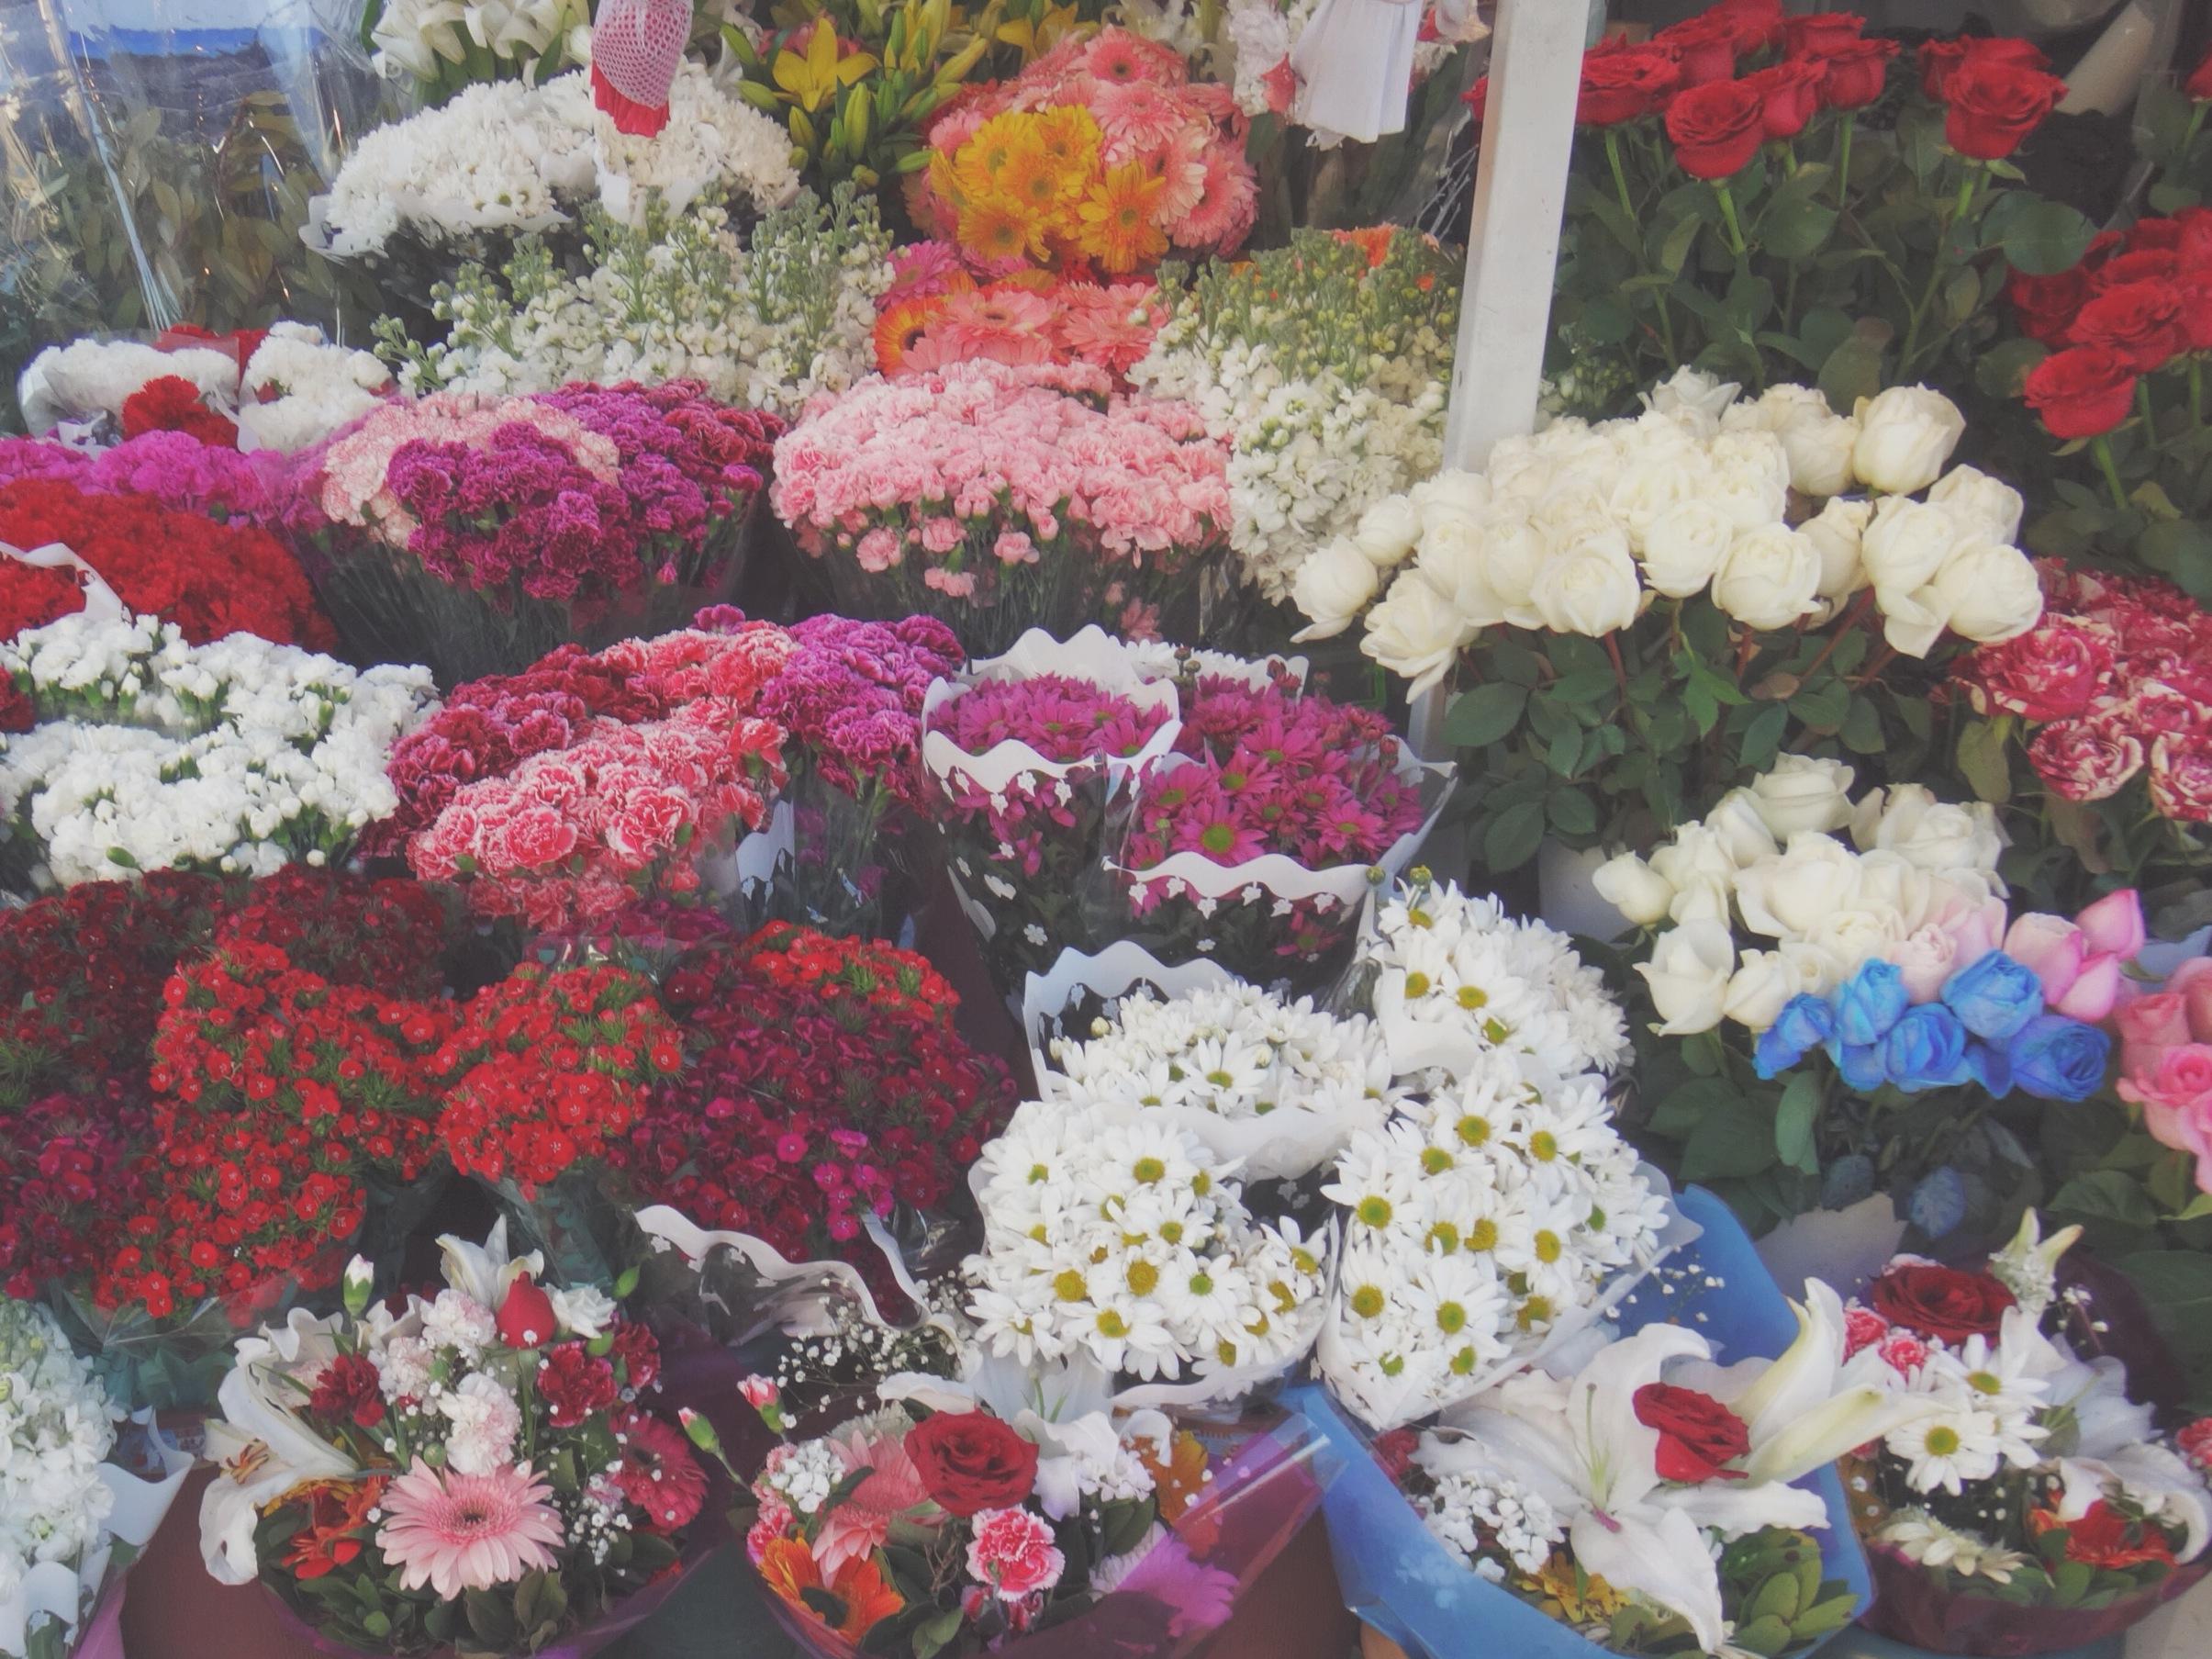 Flower Shop at Taksim Square, Istanbul